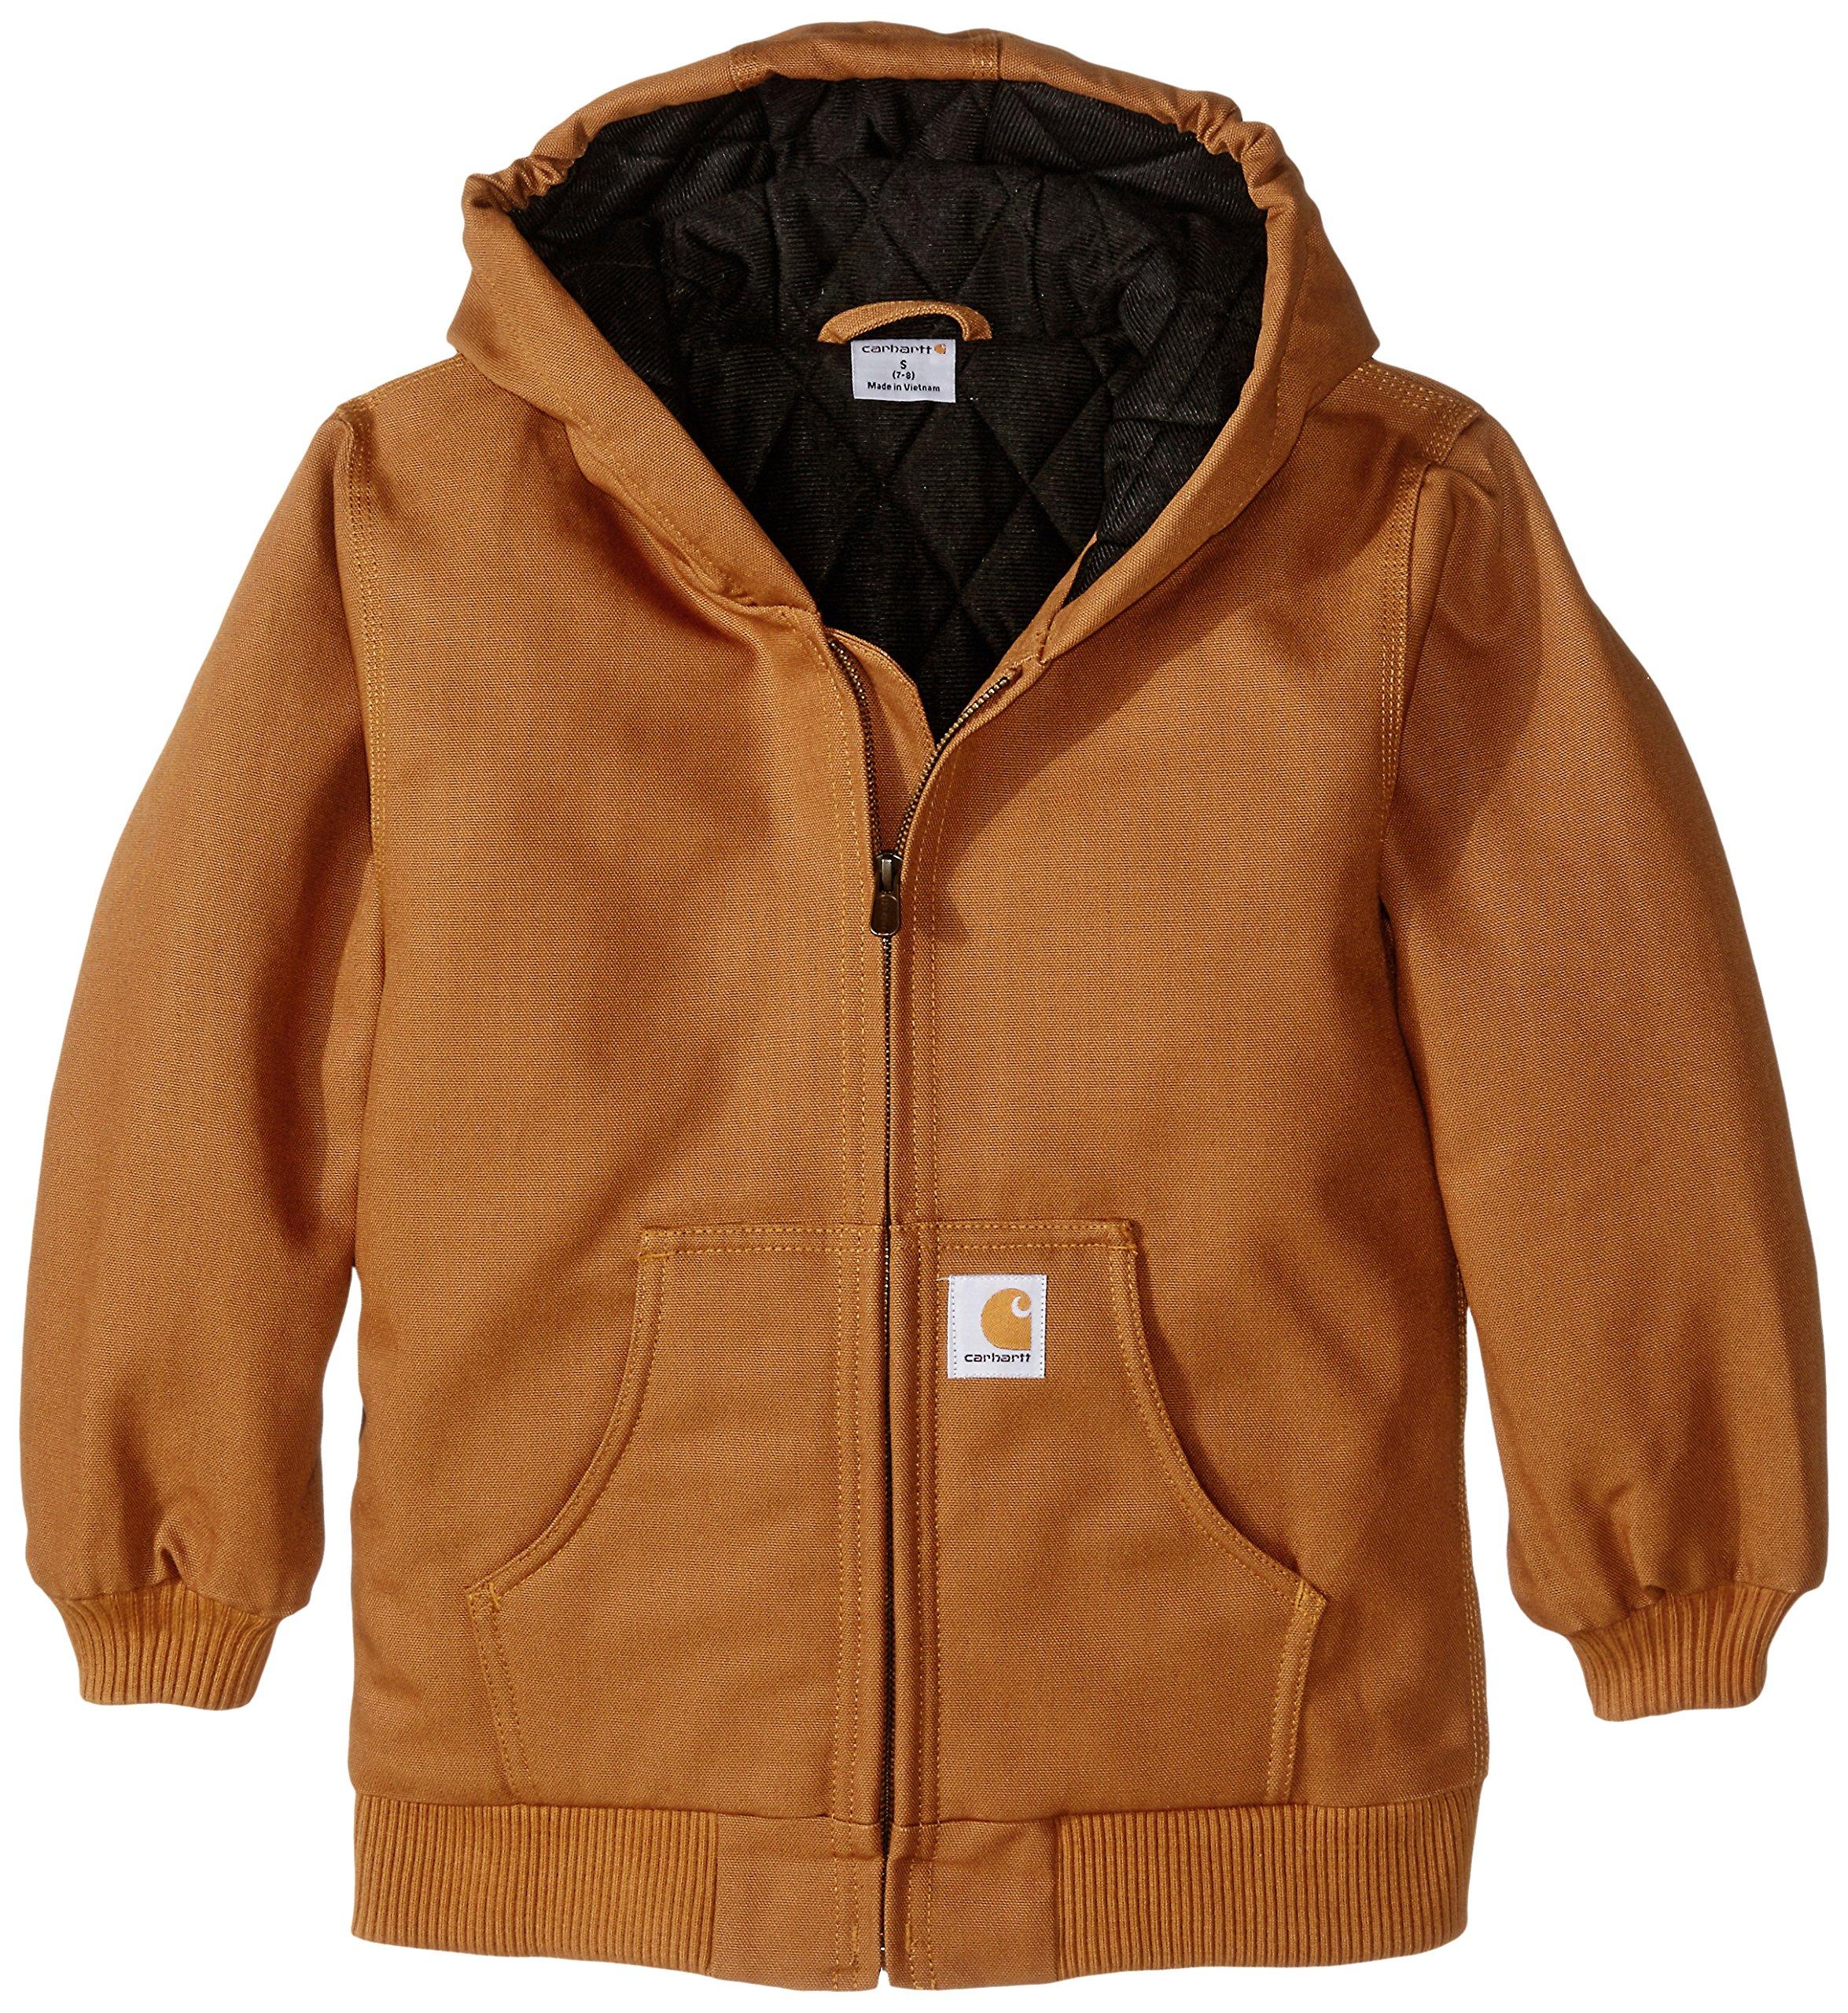 Carhartt Big Boys' Active Duck Jacket, Brown, Small-7/8